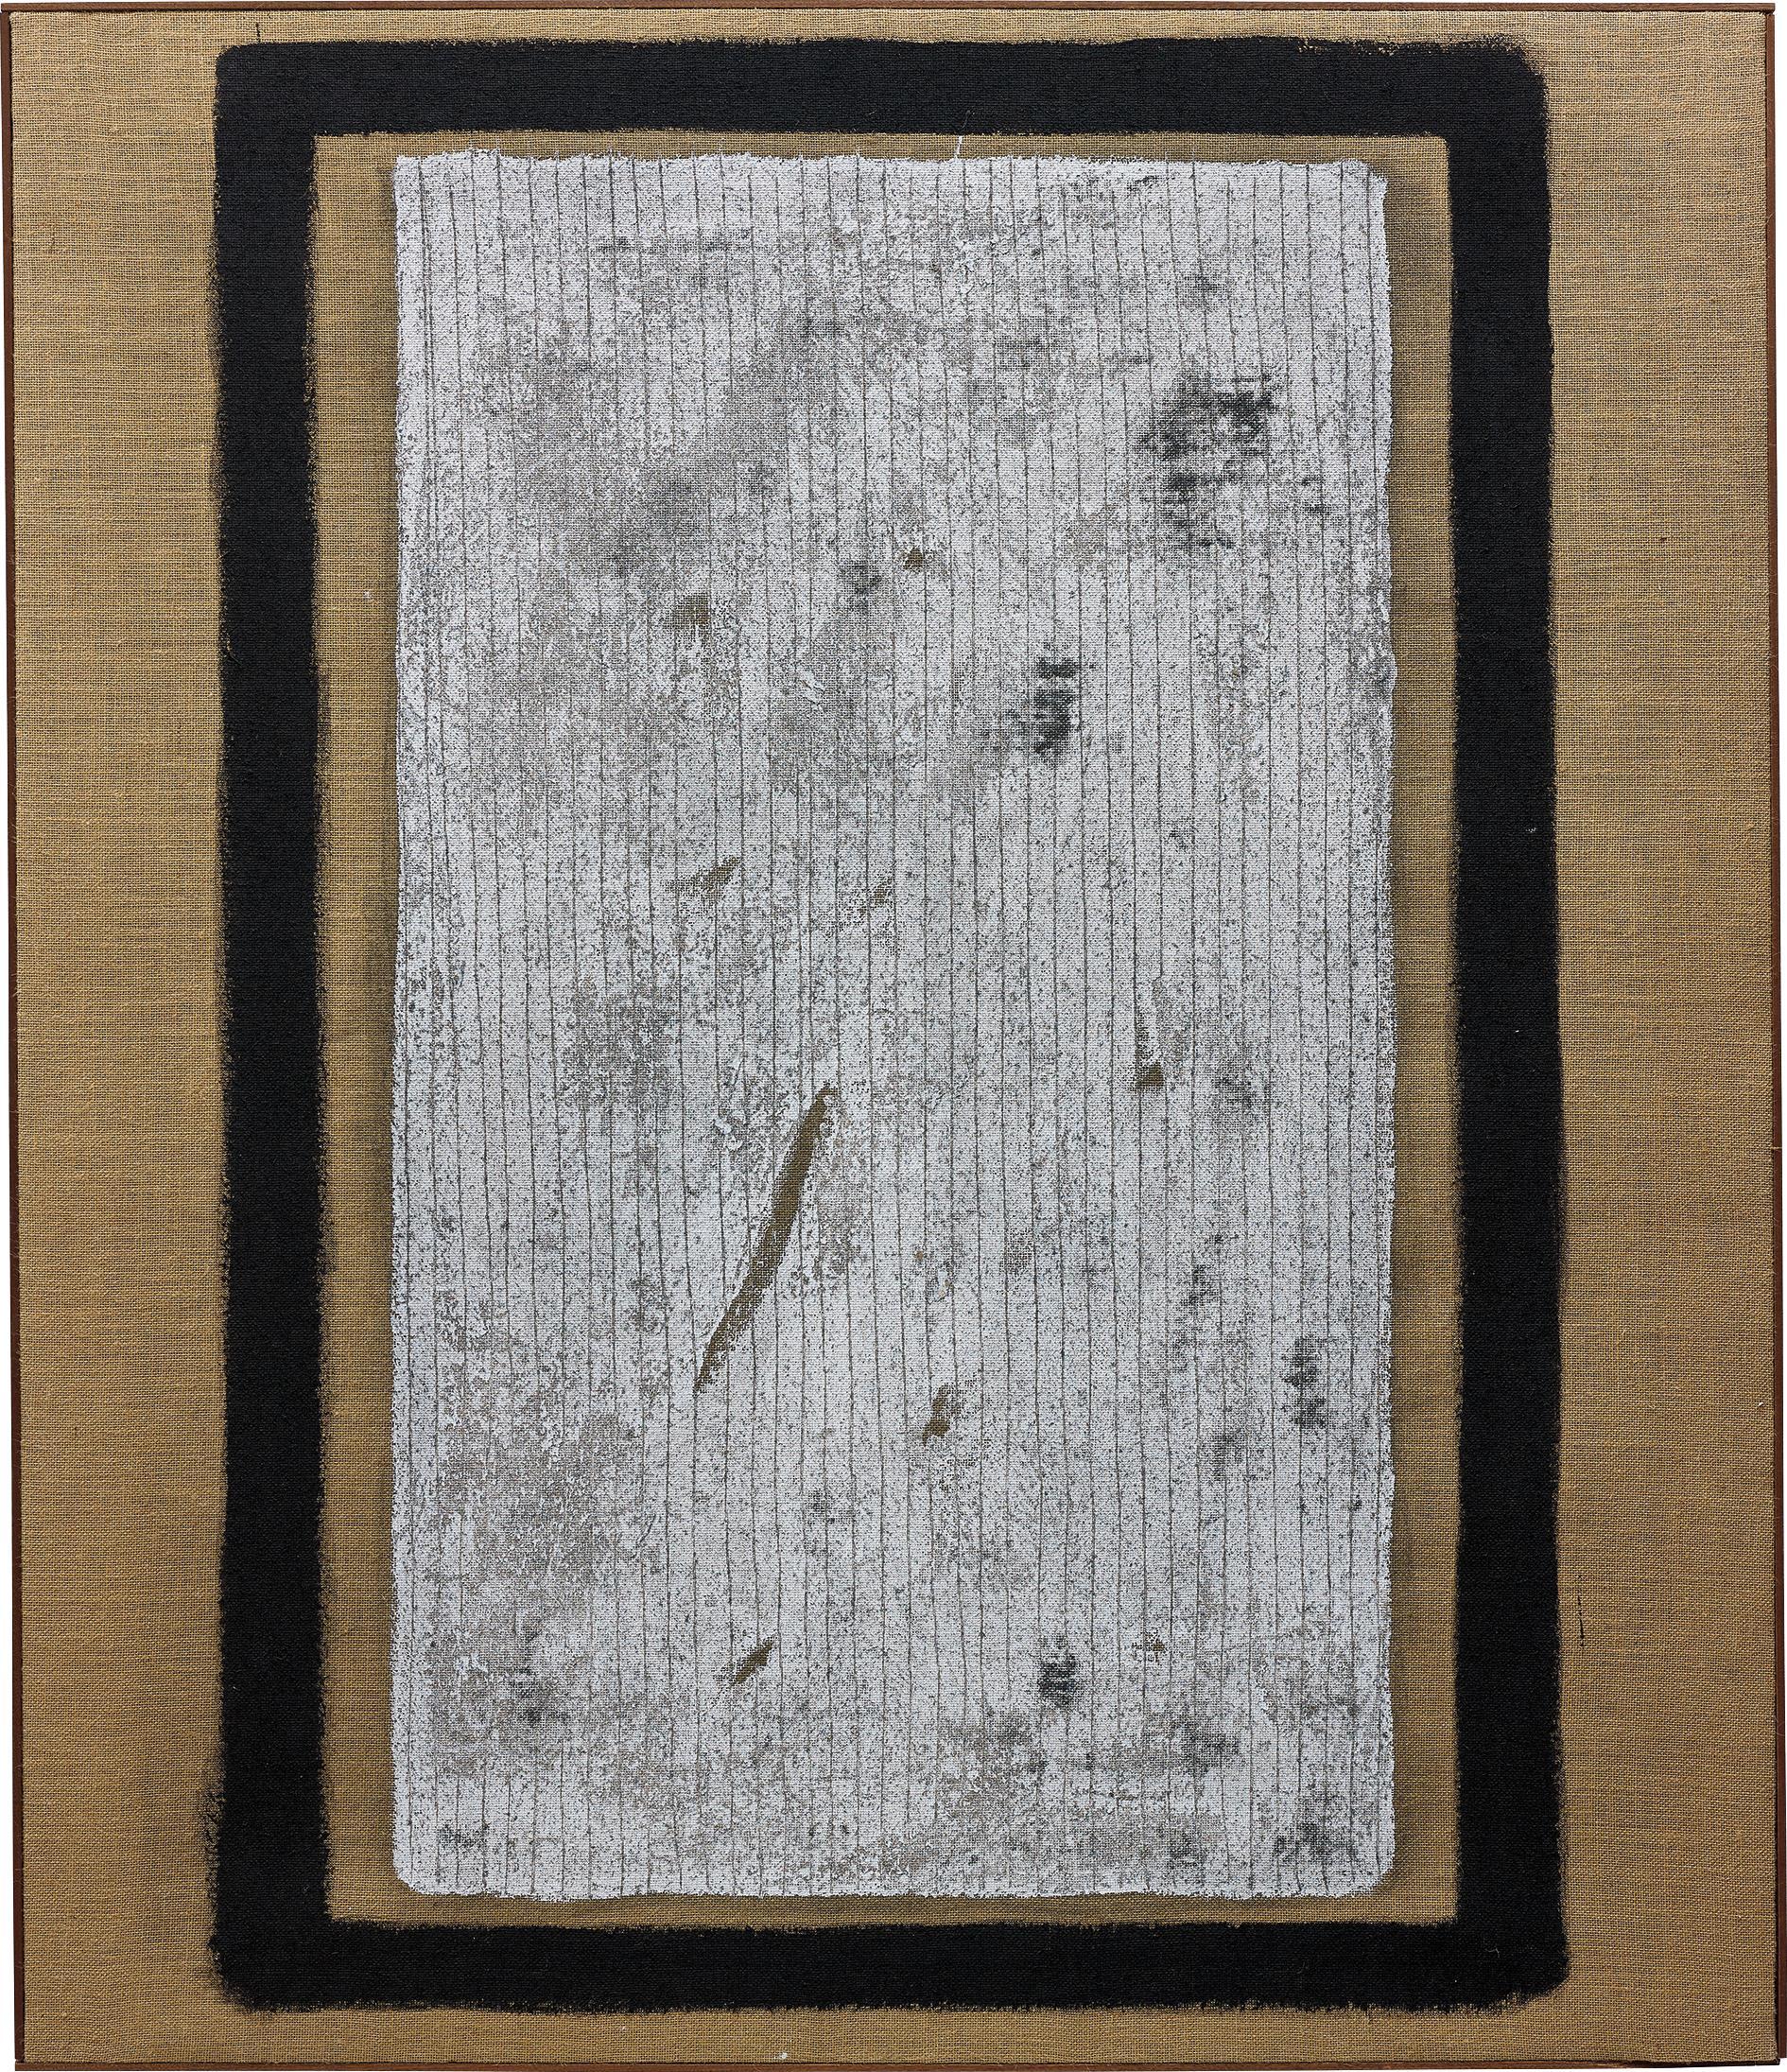 Salvatore Emblema-Materico Pitture-1965